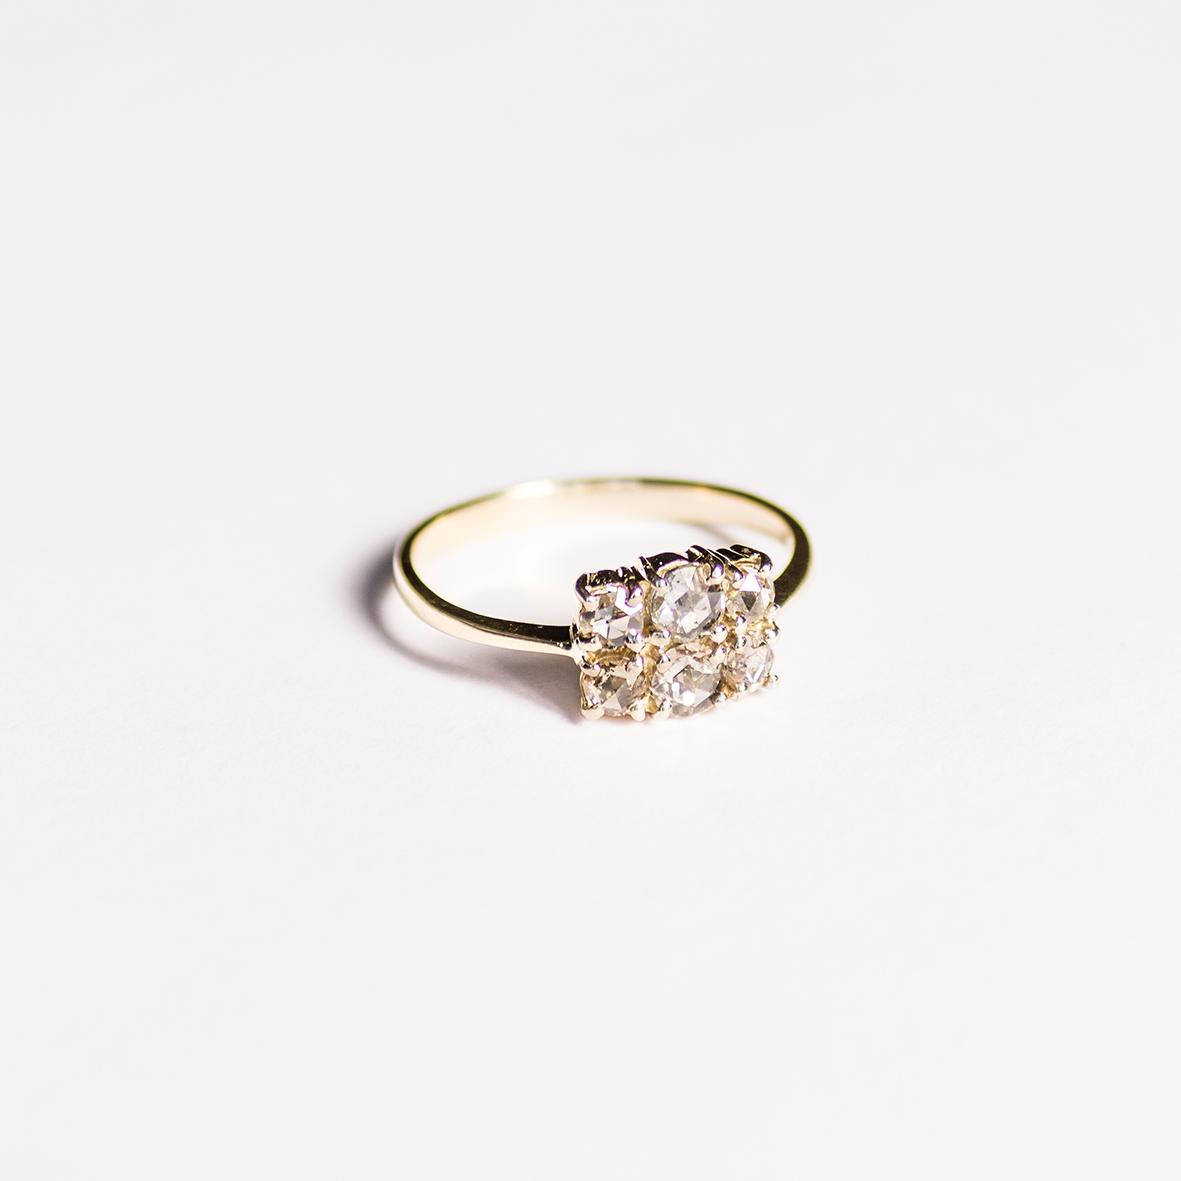 3. OONA_engagement_principal_six rose cut diamond ring